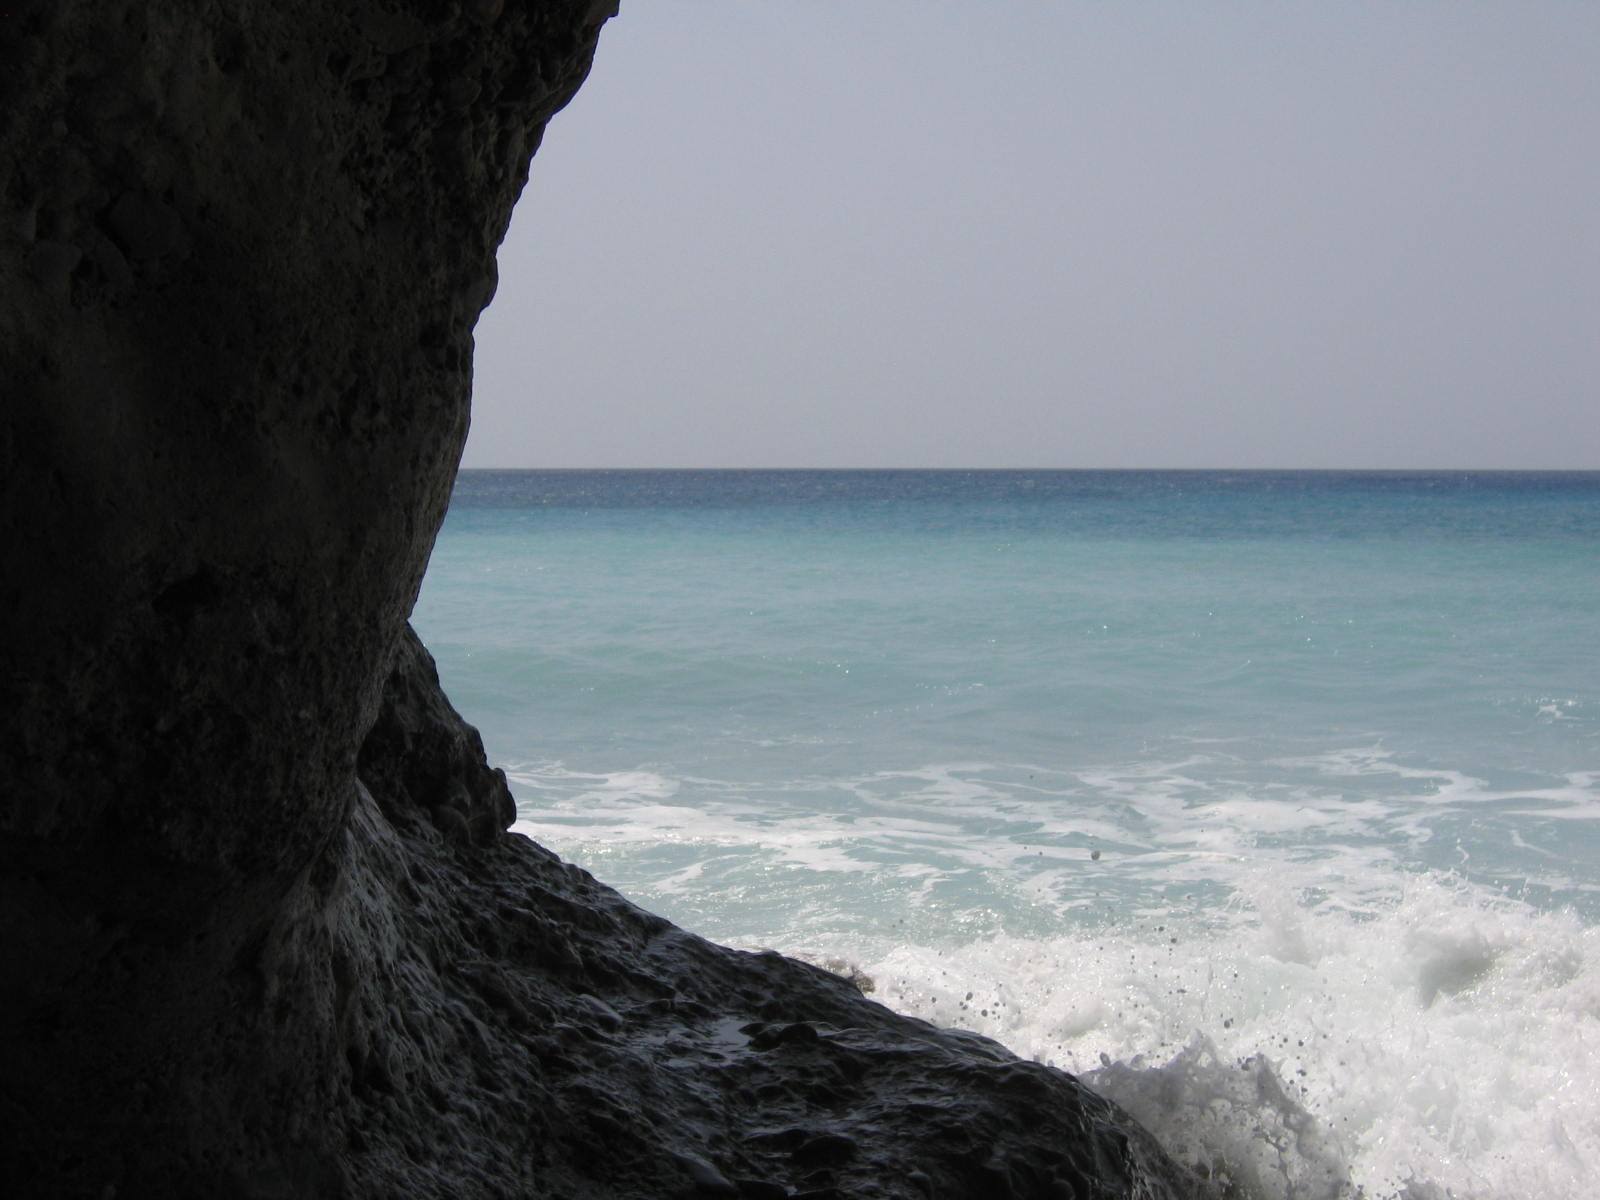 Waves, sea, rock